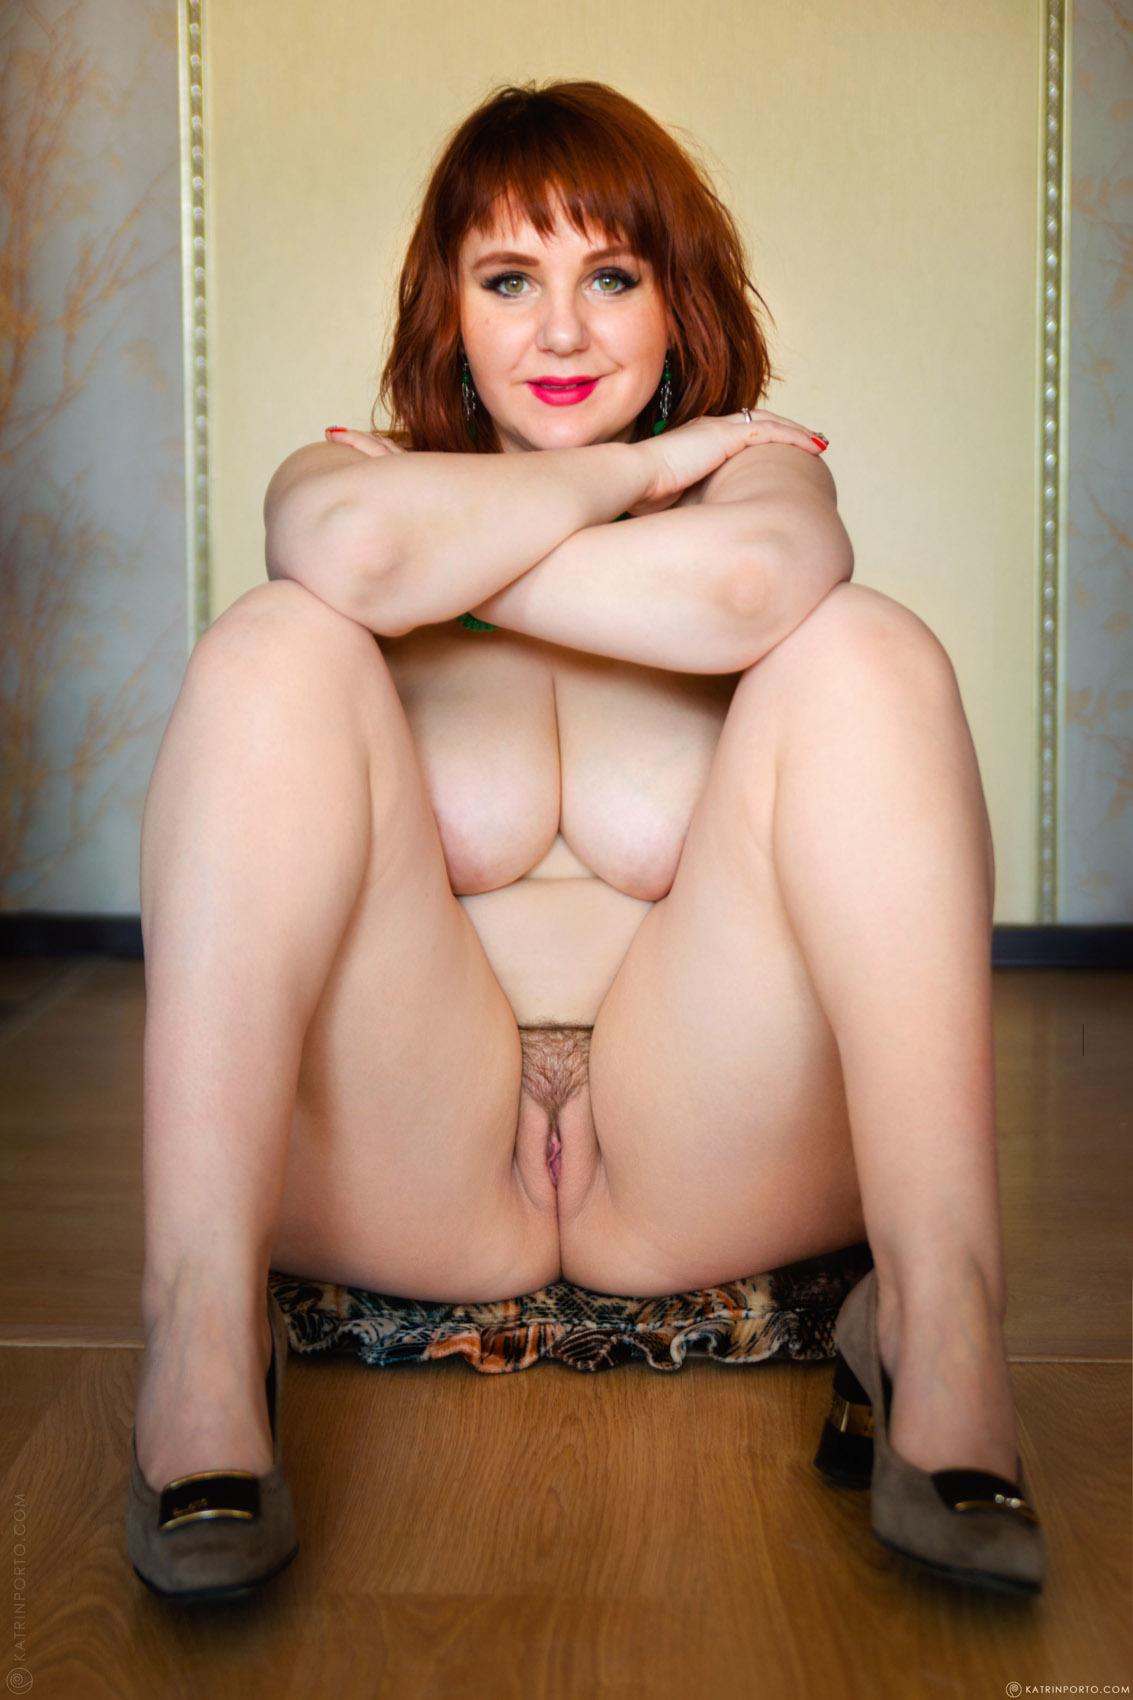 big curves nudes